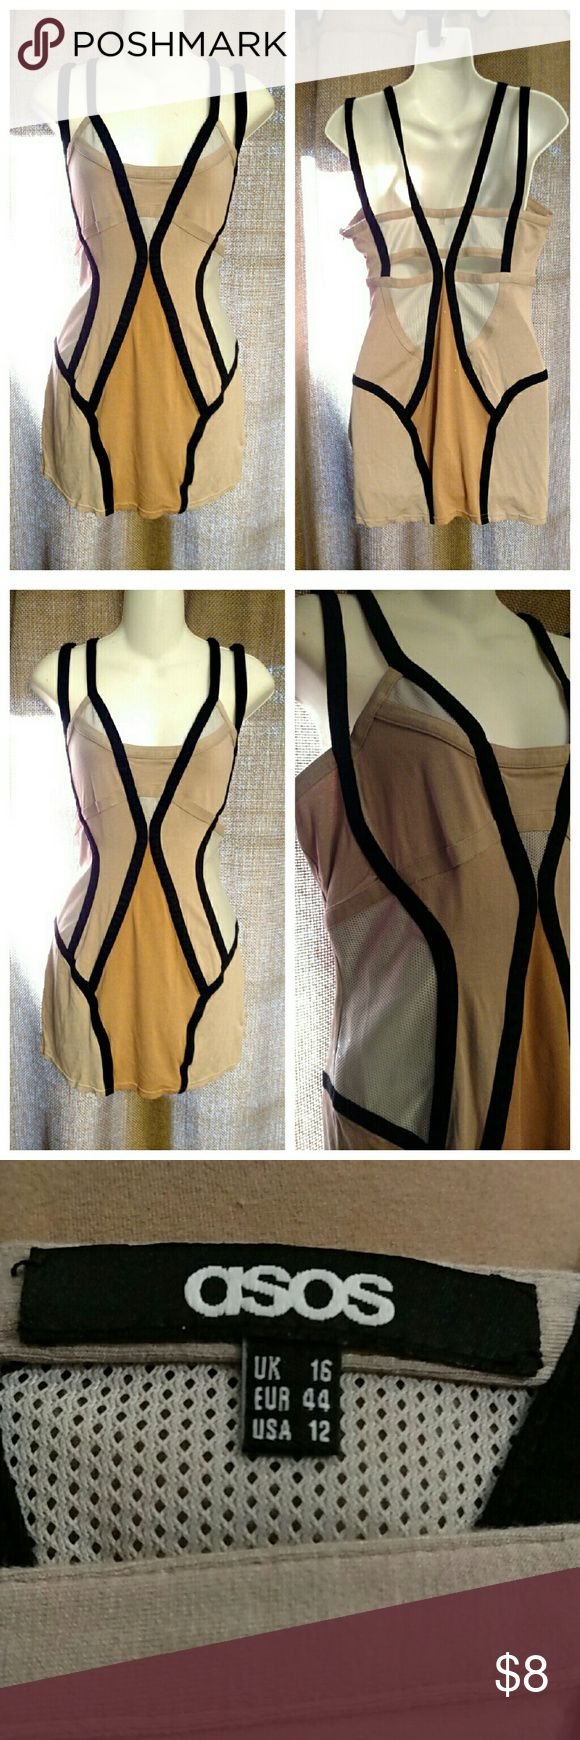 ASOS CURVE bodycon dress wiggle uk16 us12 Used, freshly washed. UK 16 / US 12  Stretchy Shows wear ASOS Curve Dresses